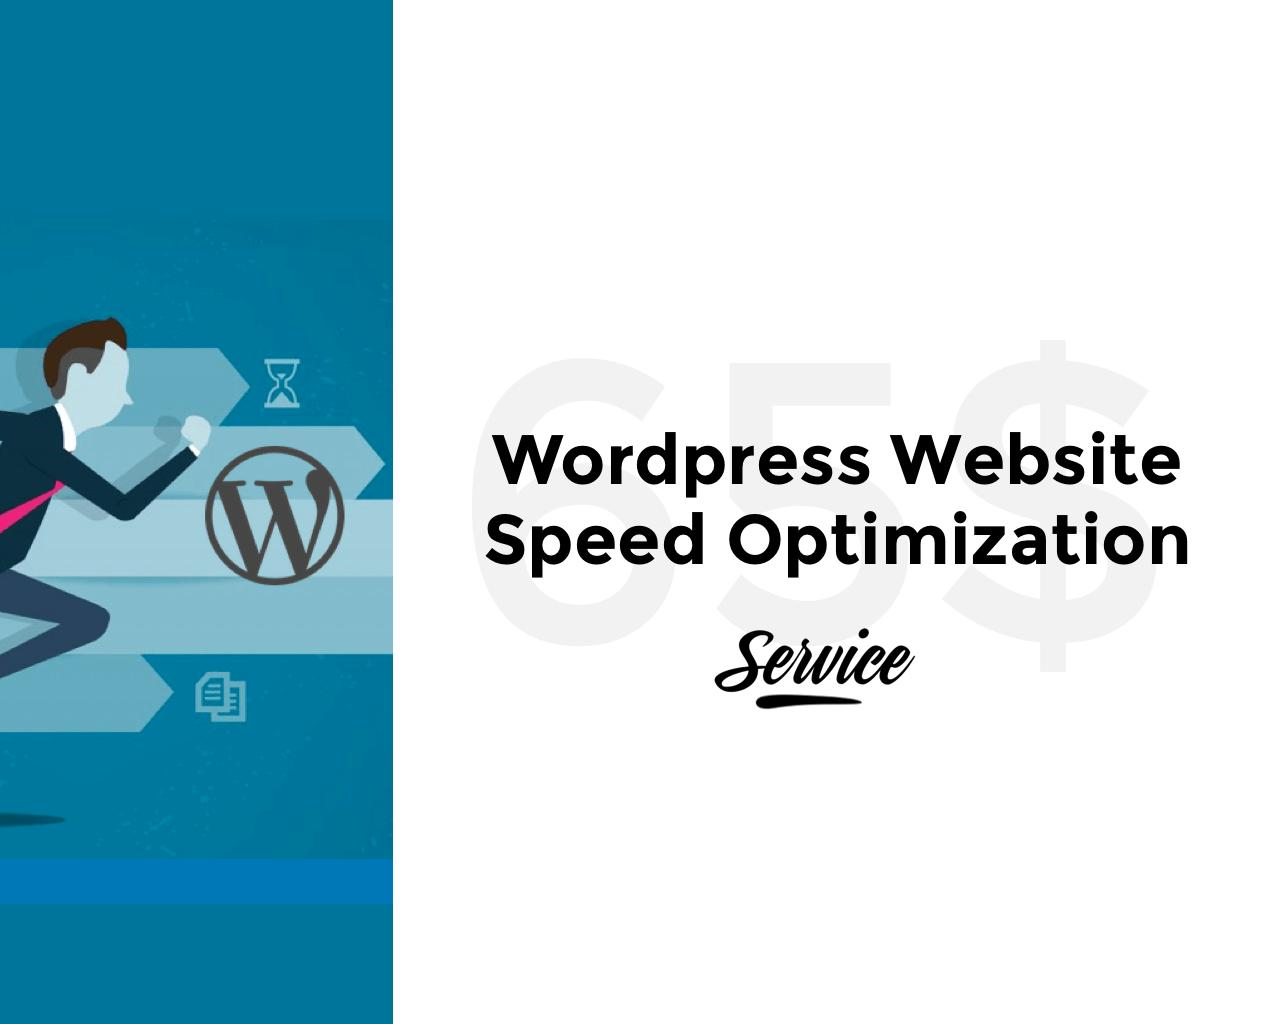 wordpress website speed optimization by pixelthrone on